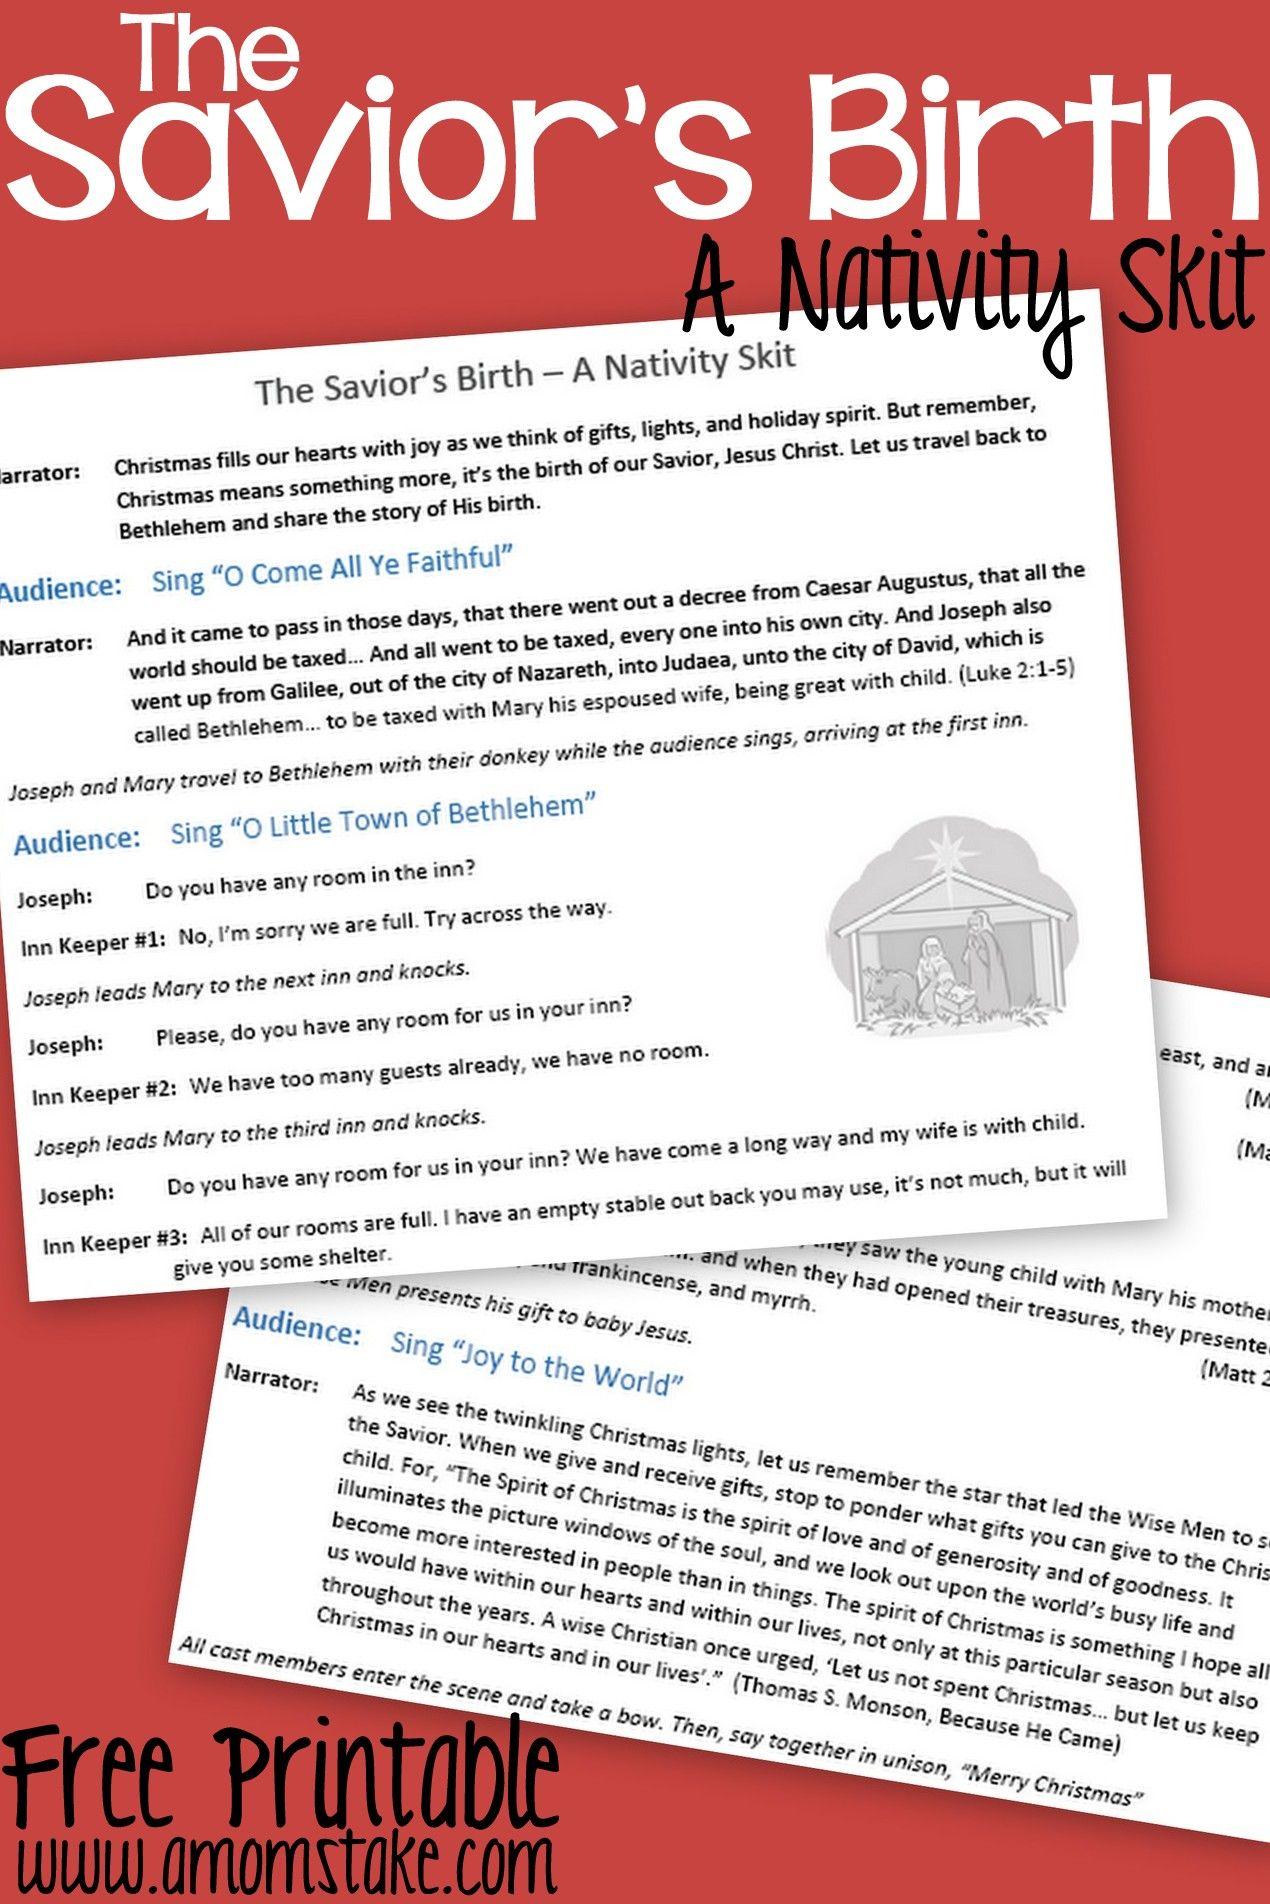 The Savior's Birth A Nativity Skit Script with Music